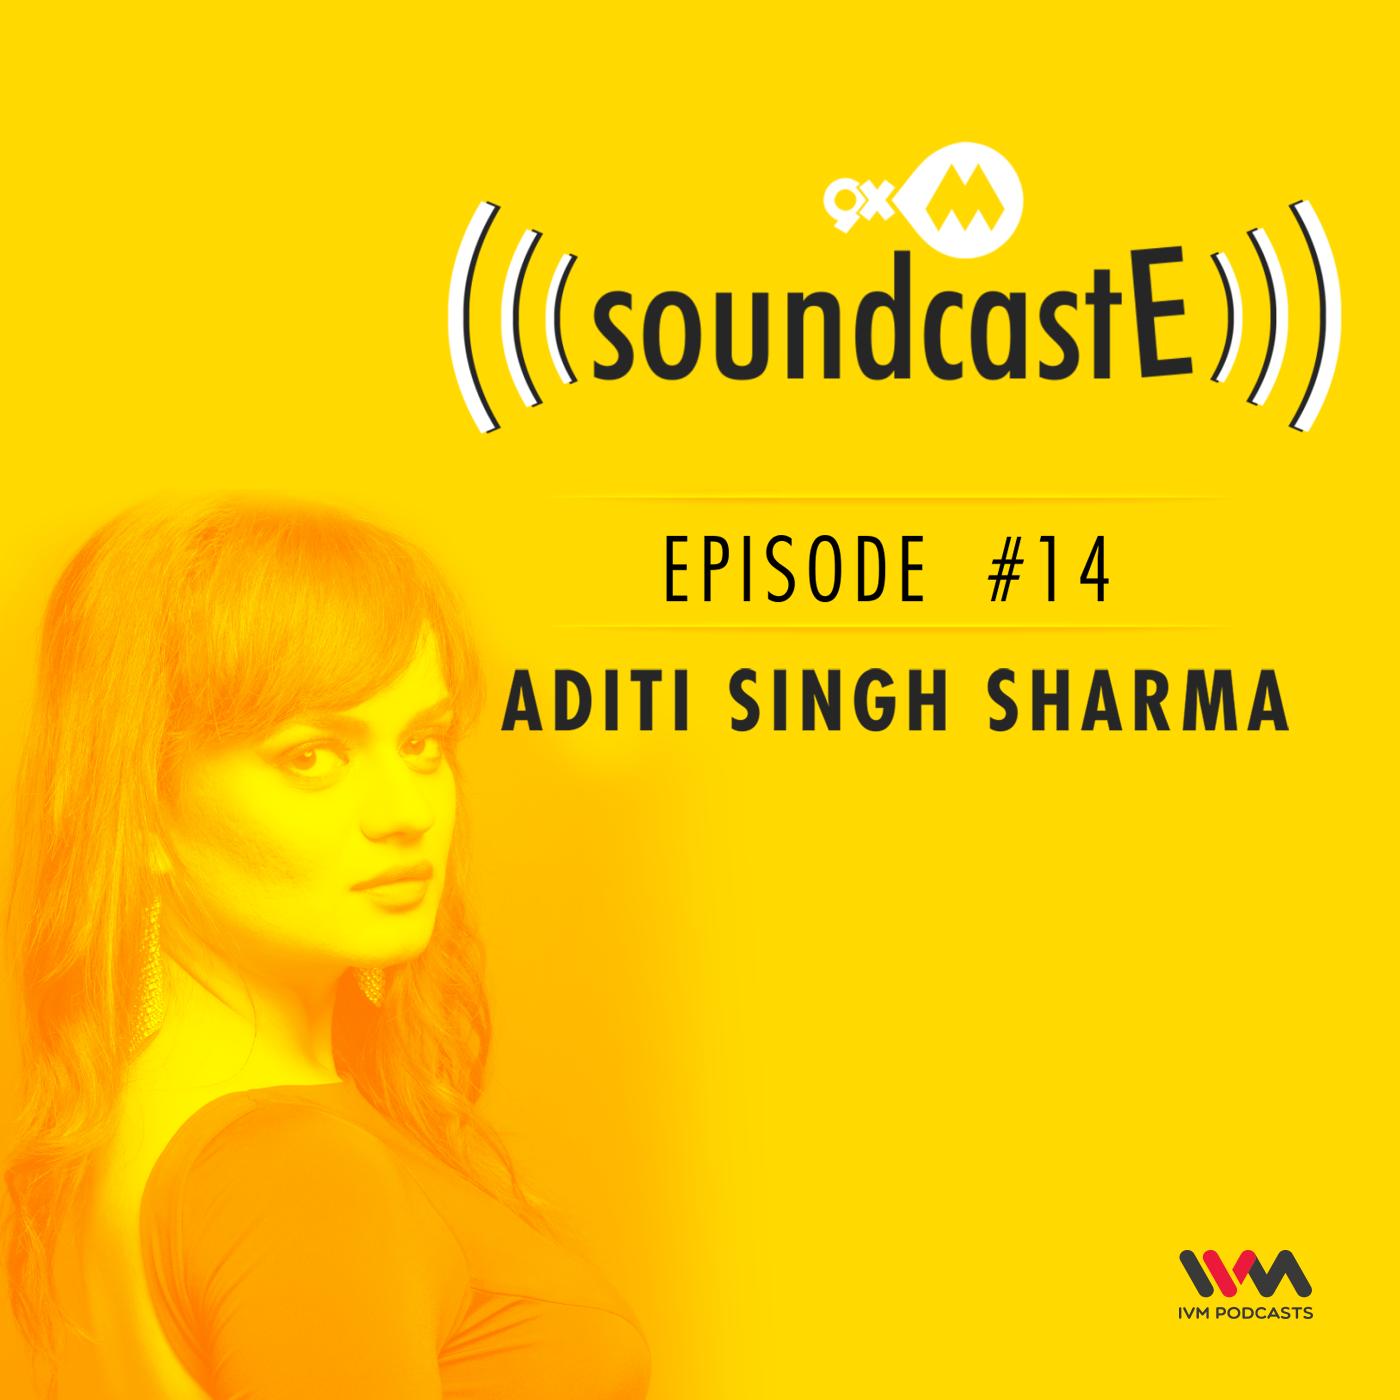 Ep. 14: 9XM SoundcastE Aditi Singh Sharma